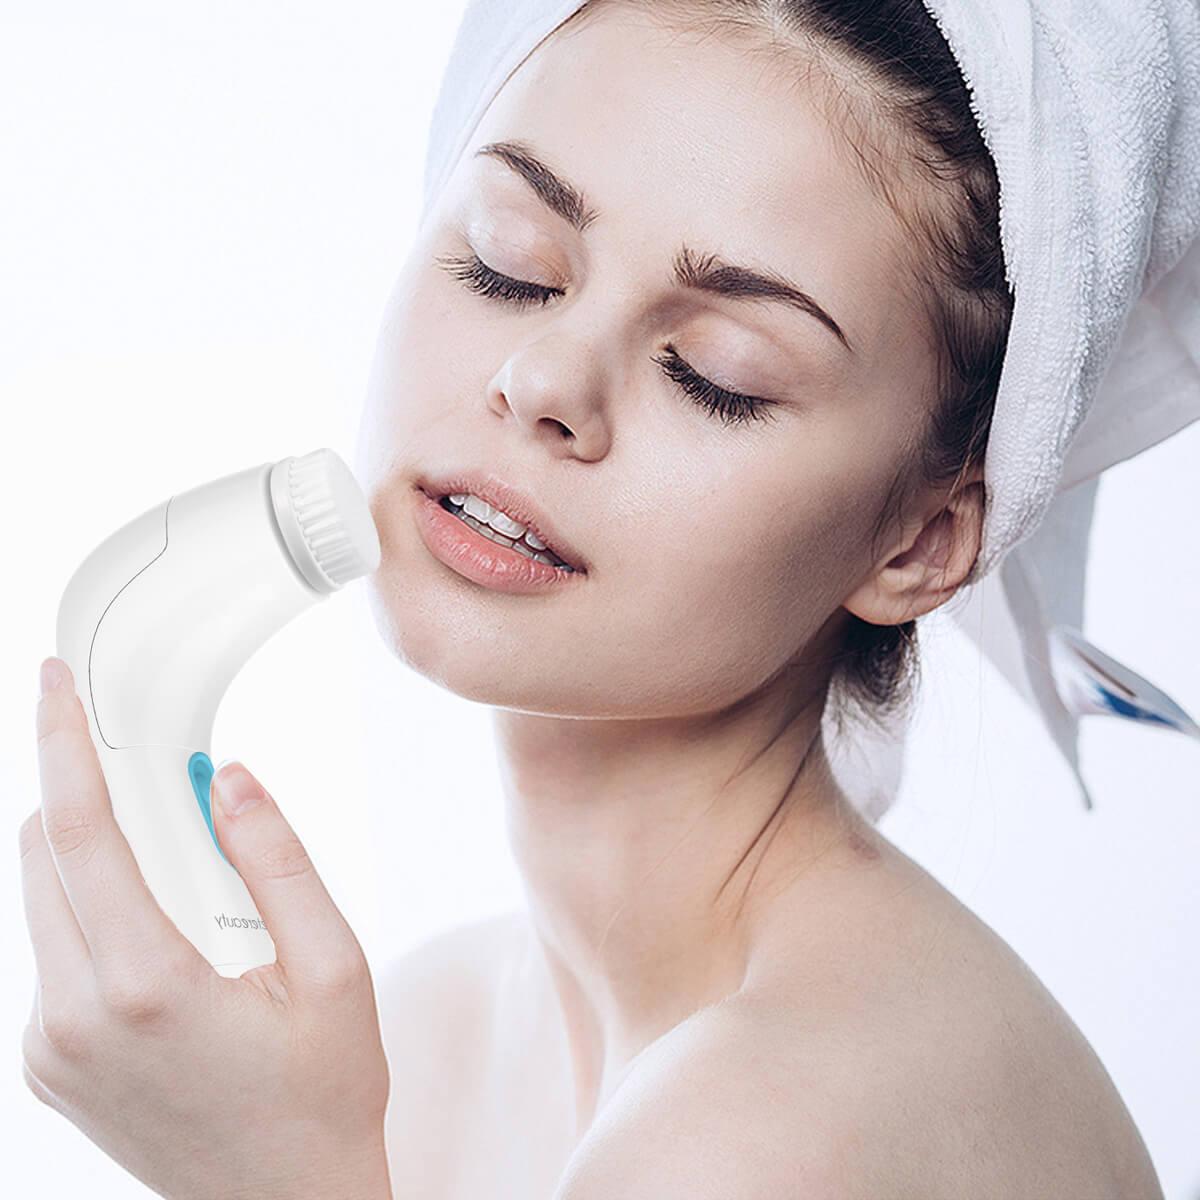 Facial Cleansing Brush, Waterproof Facial Brush Exfoliating Brush with 5 Brush Heads